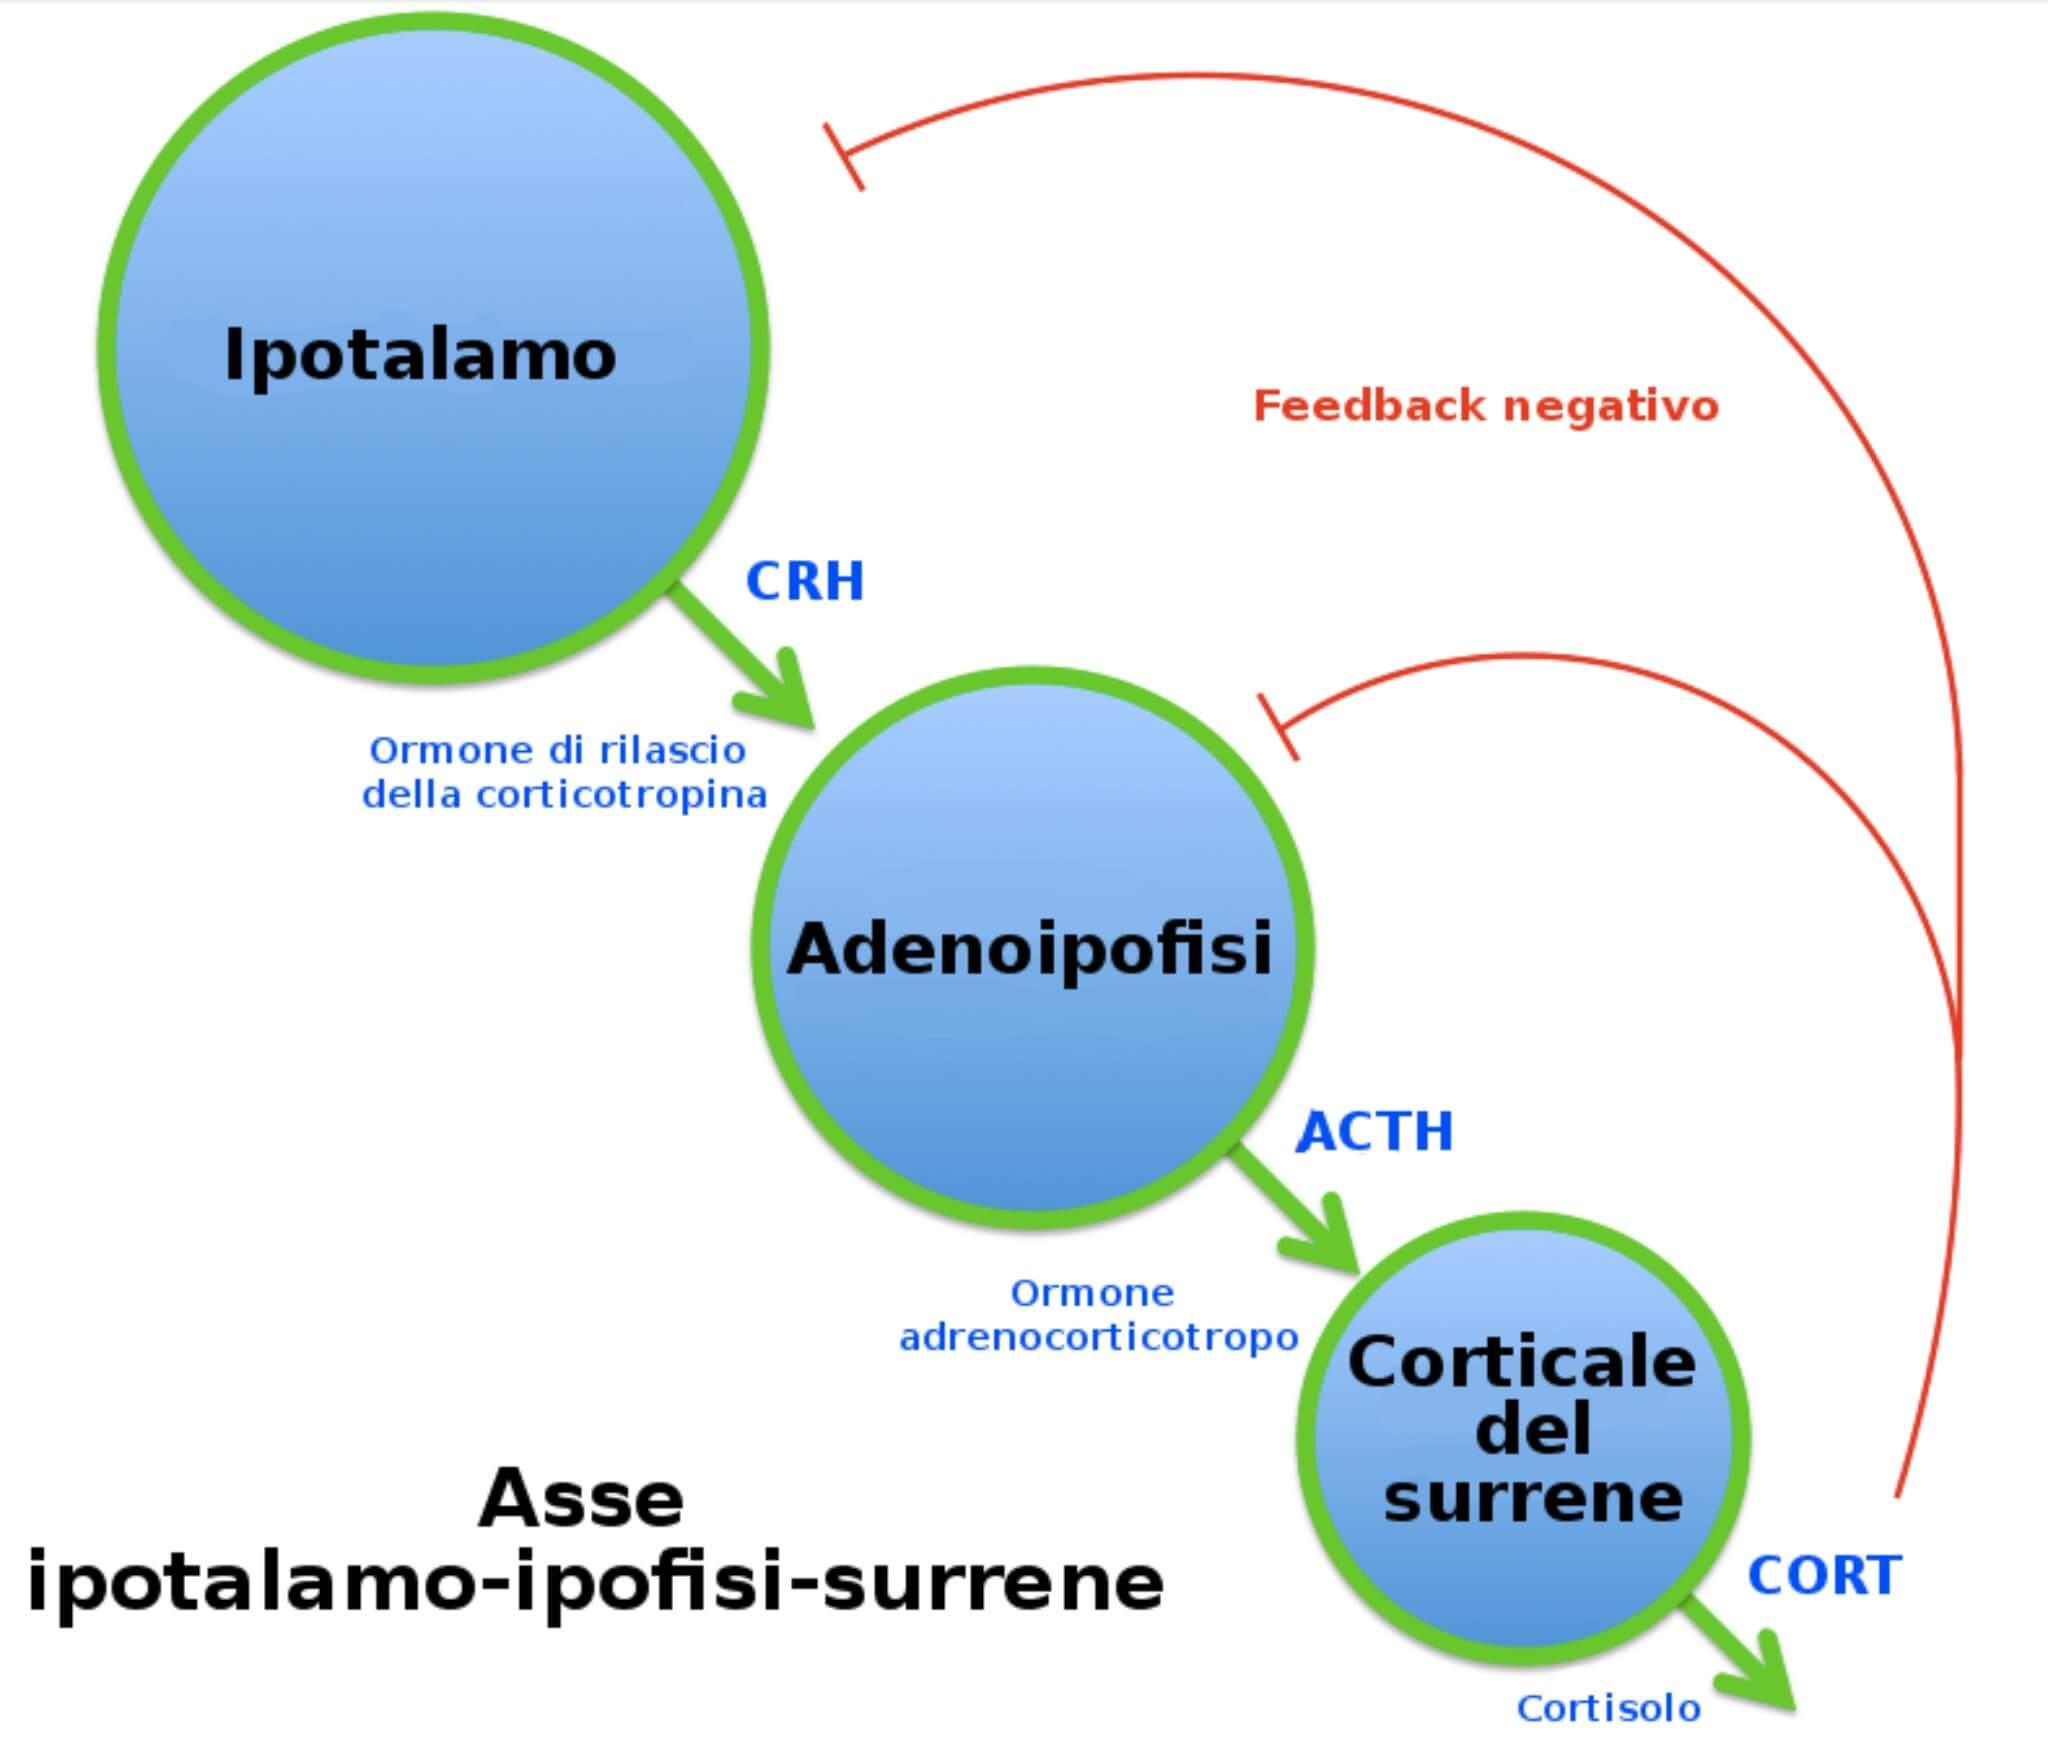 ACTH, esercizio fisico e asse ipotalamo-ipofisi-surrene